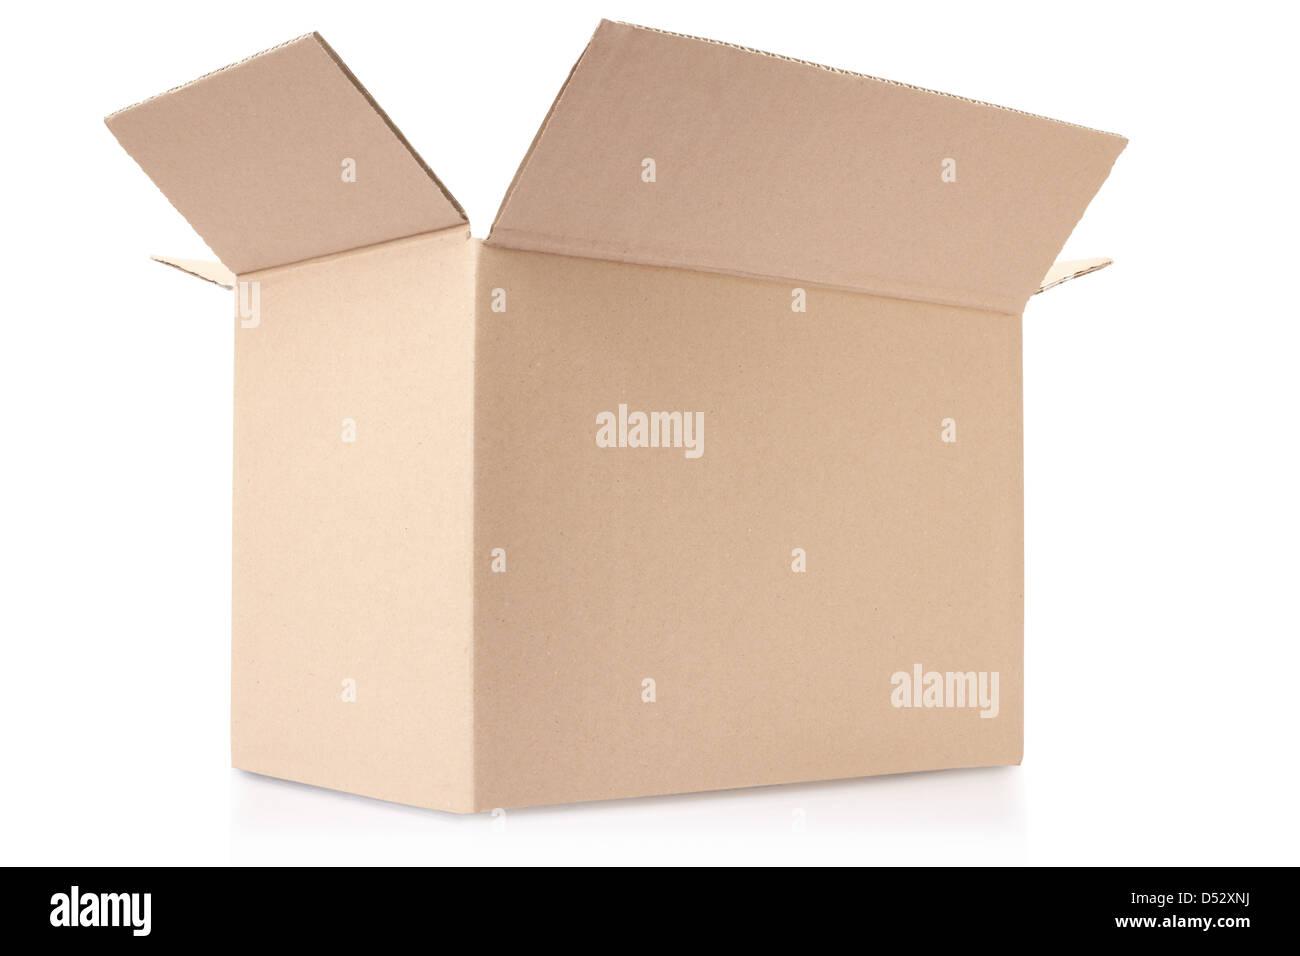 Cardboard box opened on white - Stock Image